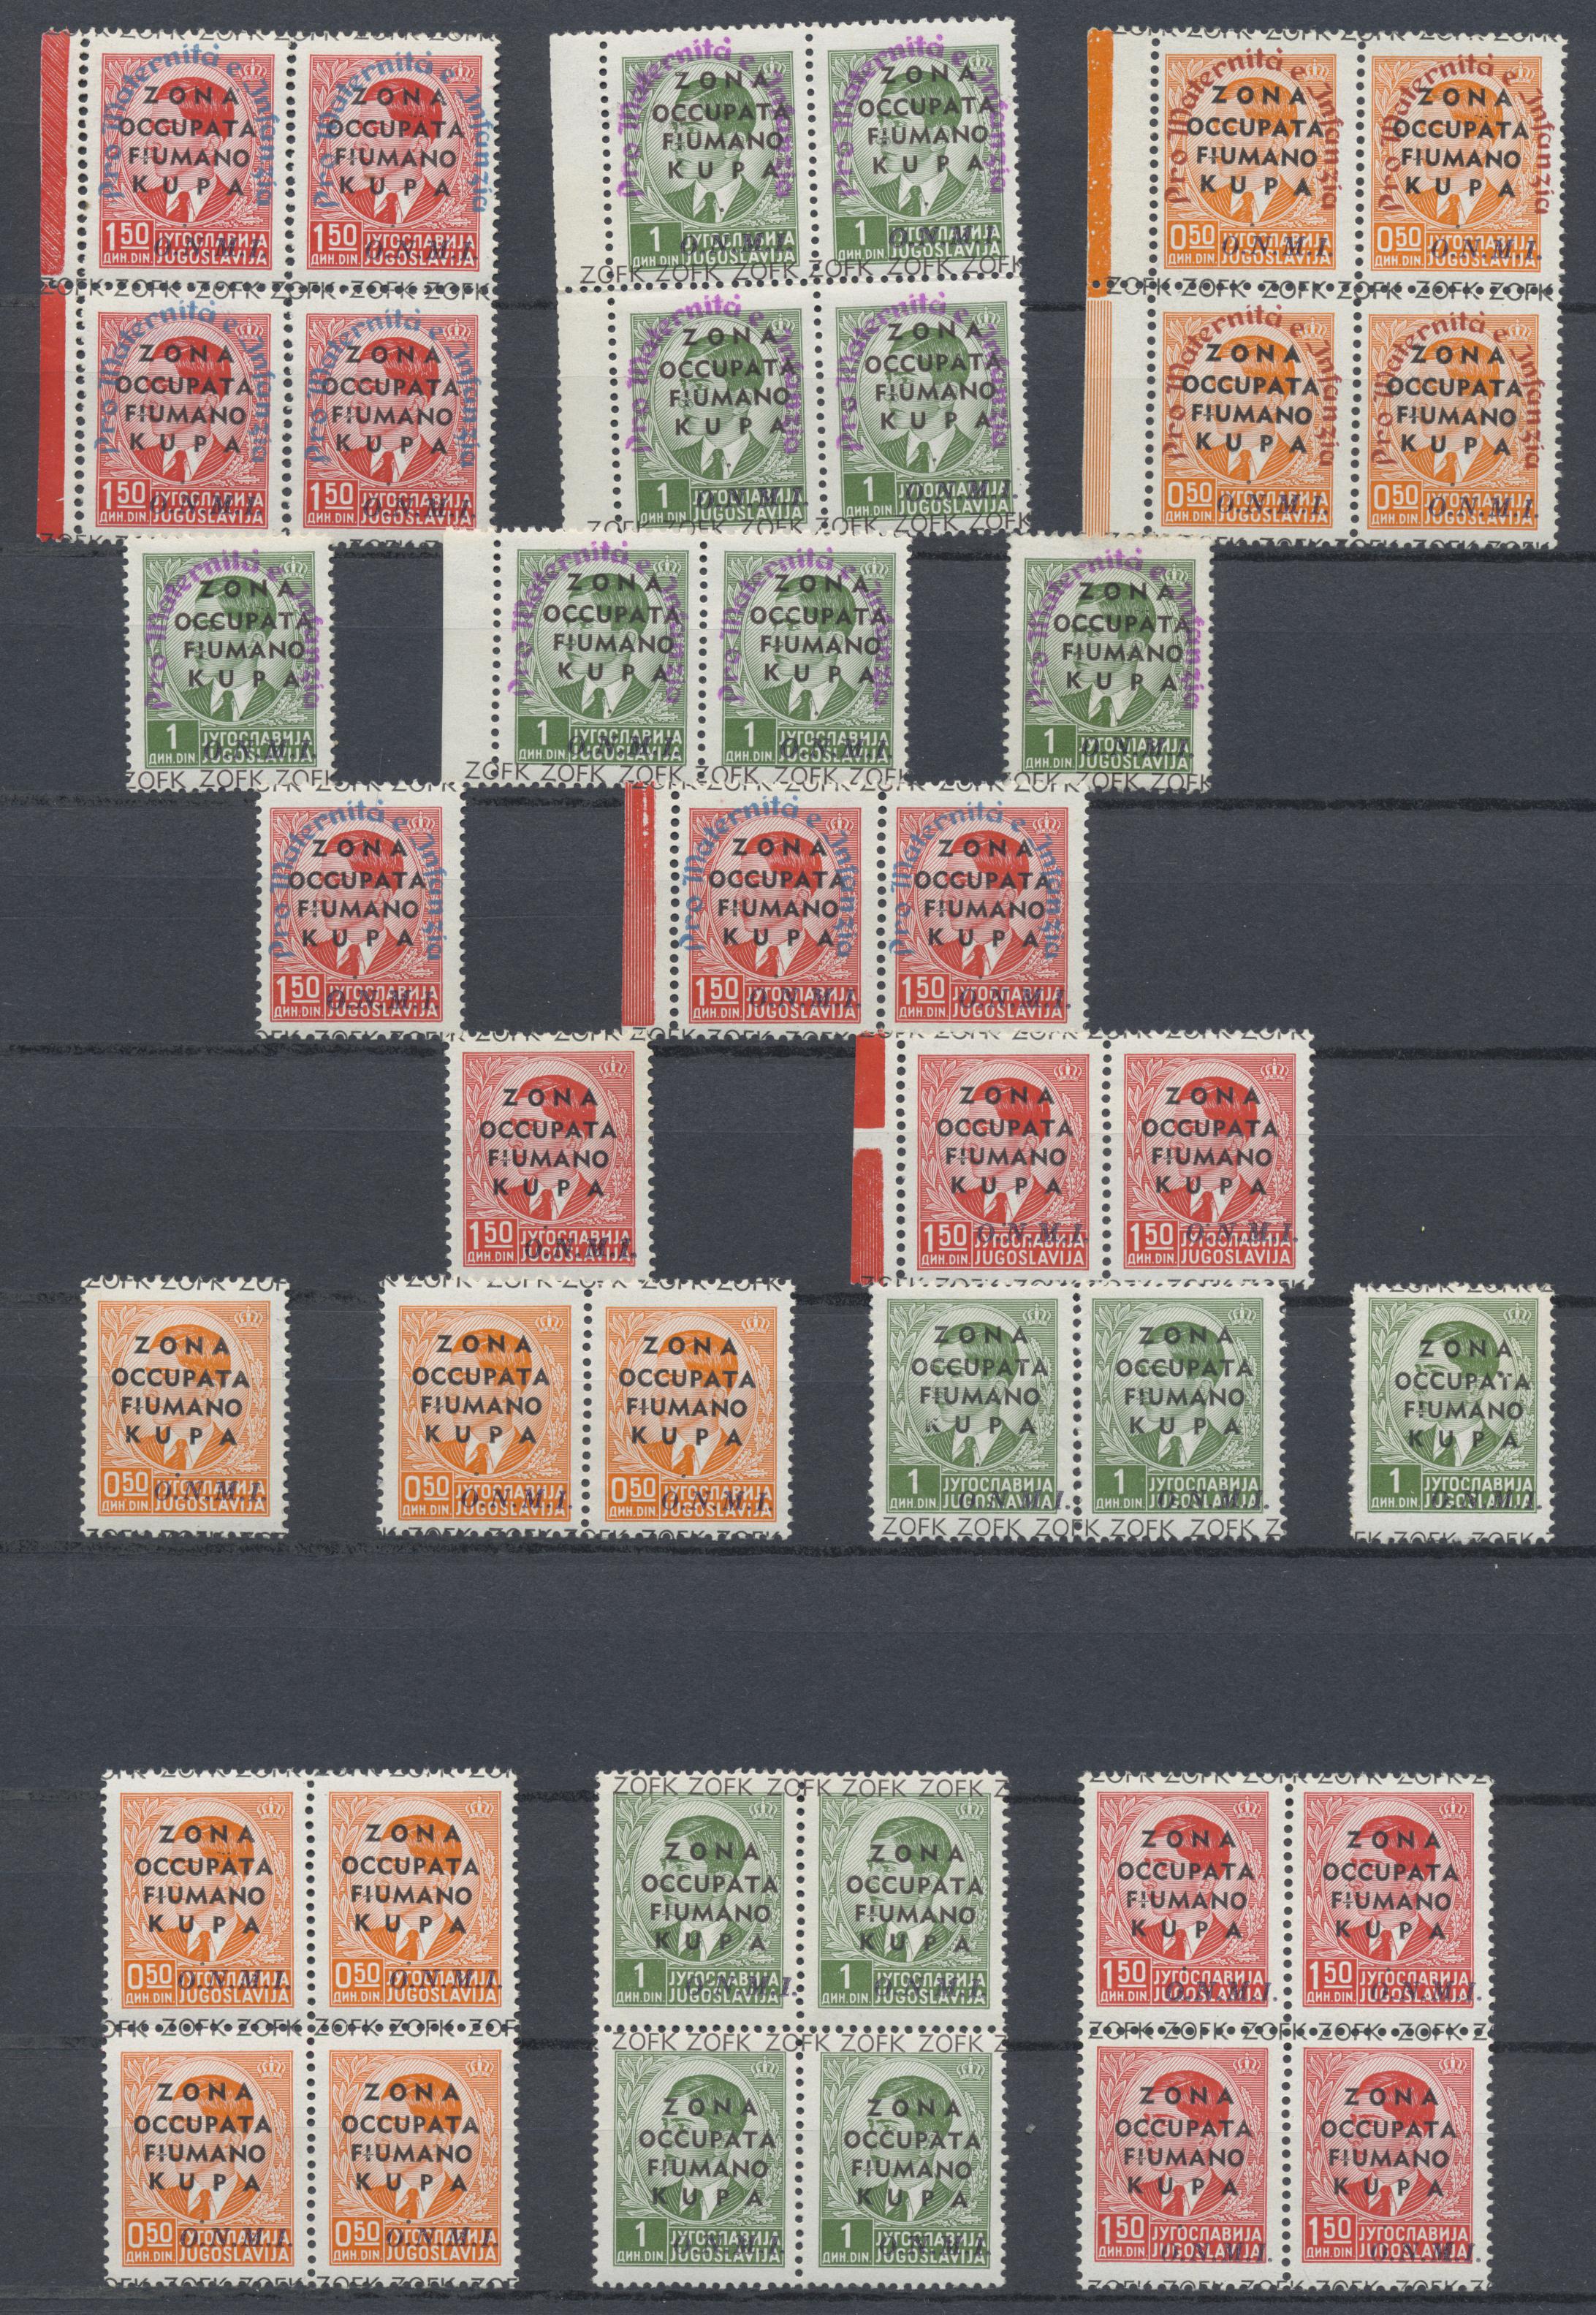 Lot 34959 - Italienische Besetzung 1941/43 - Montenegro  -  Auktionshaus Christoph Gärtner GmbH & Co. KG Sale #44 Collections Germany